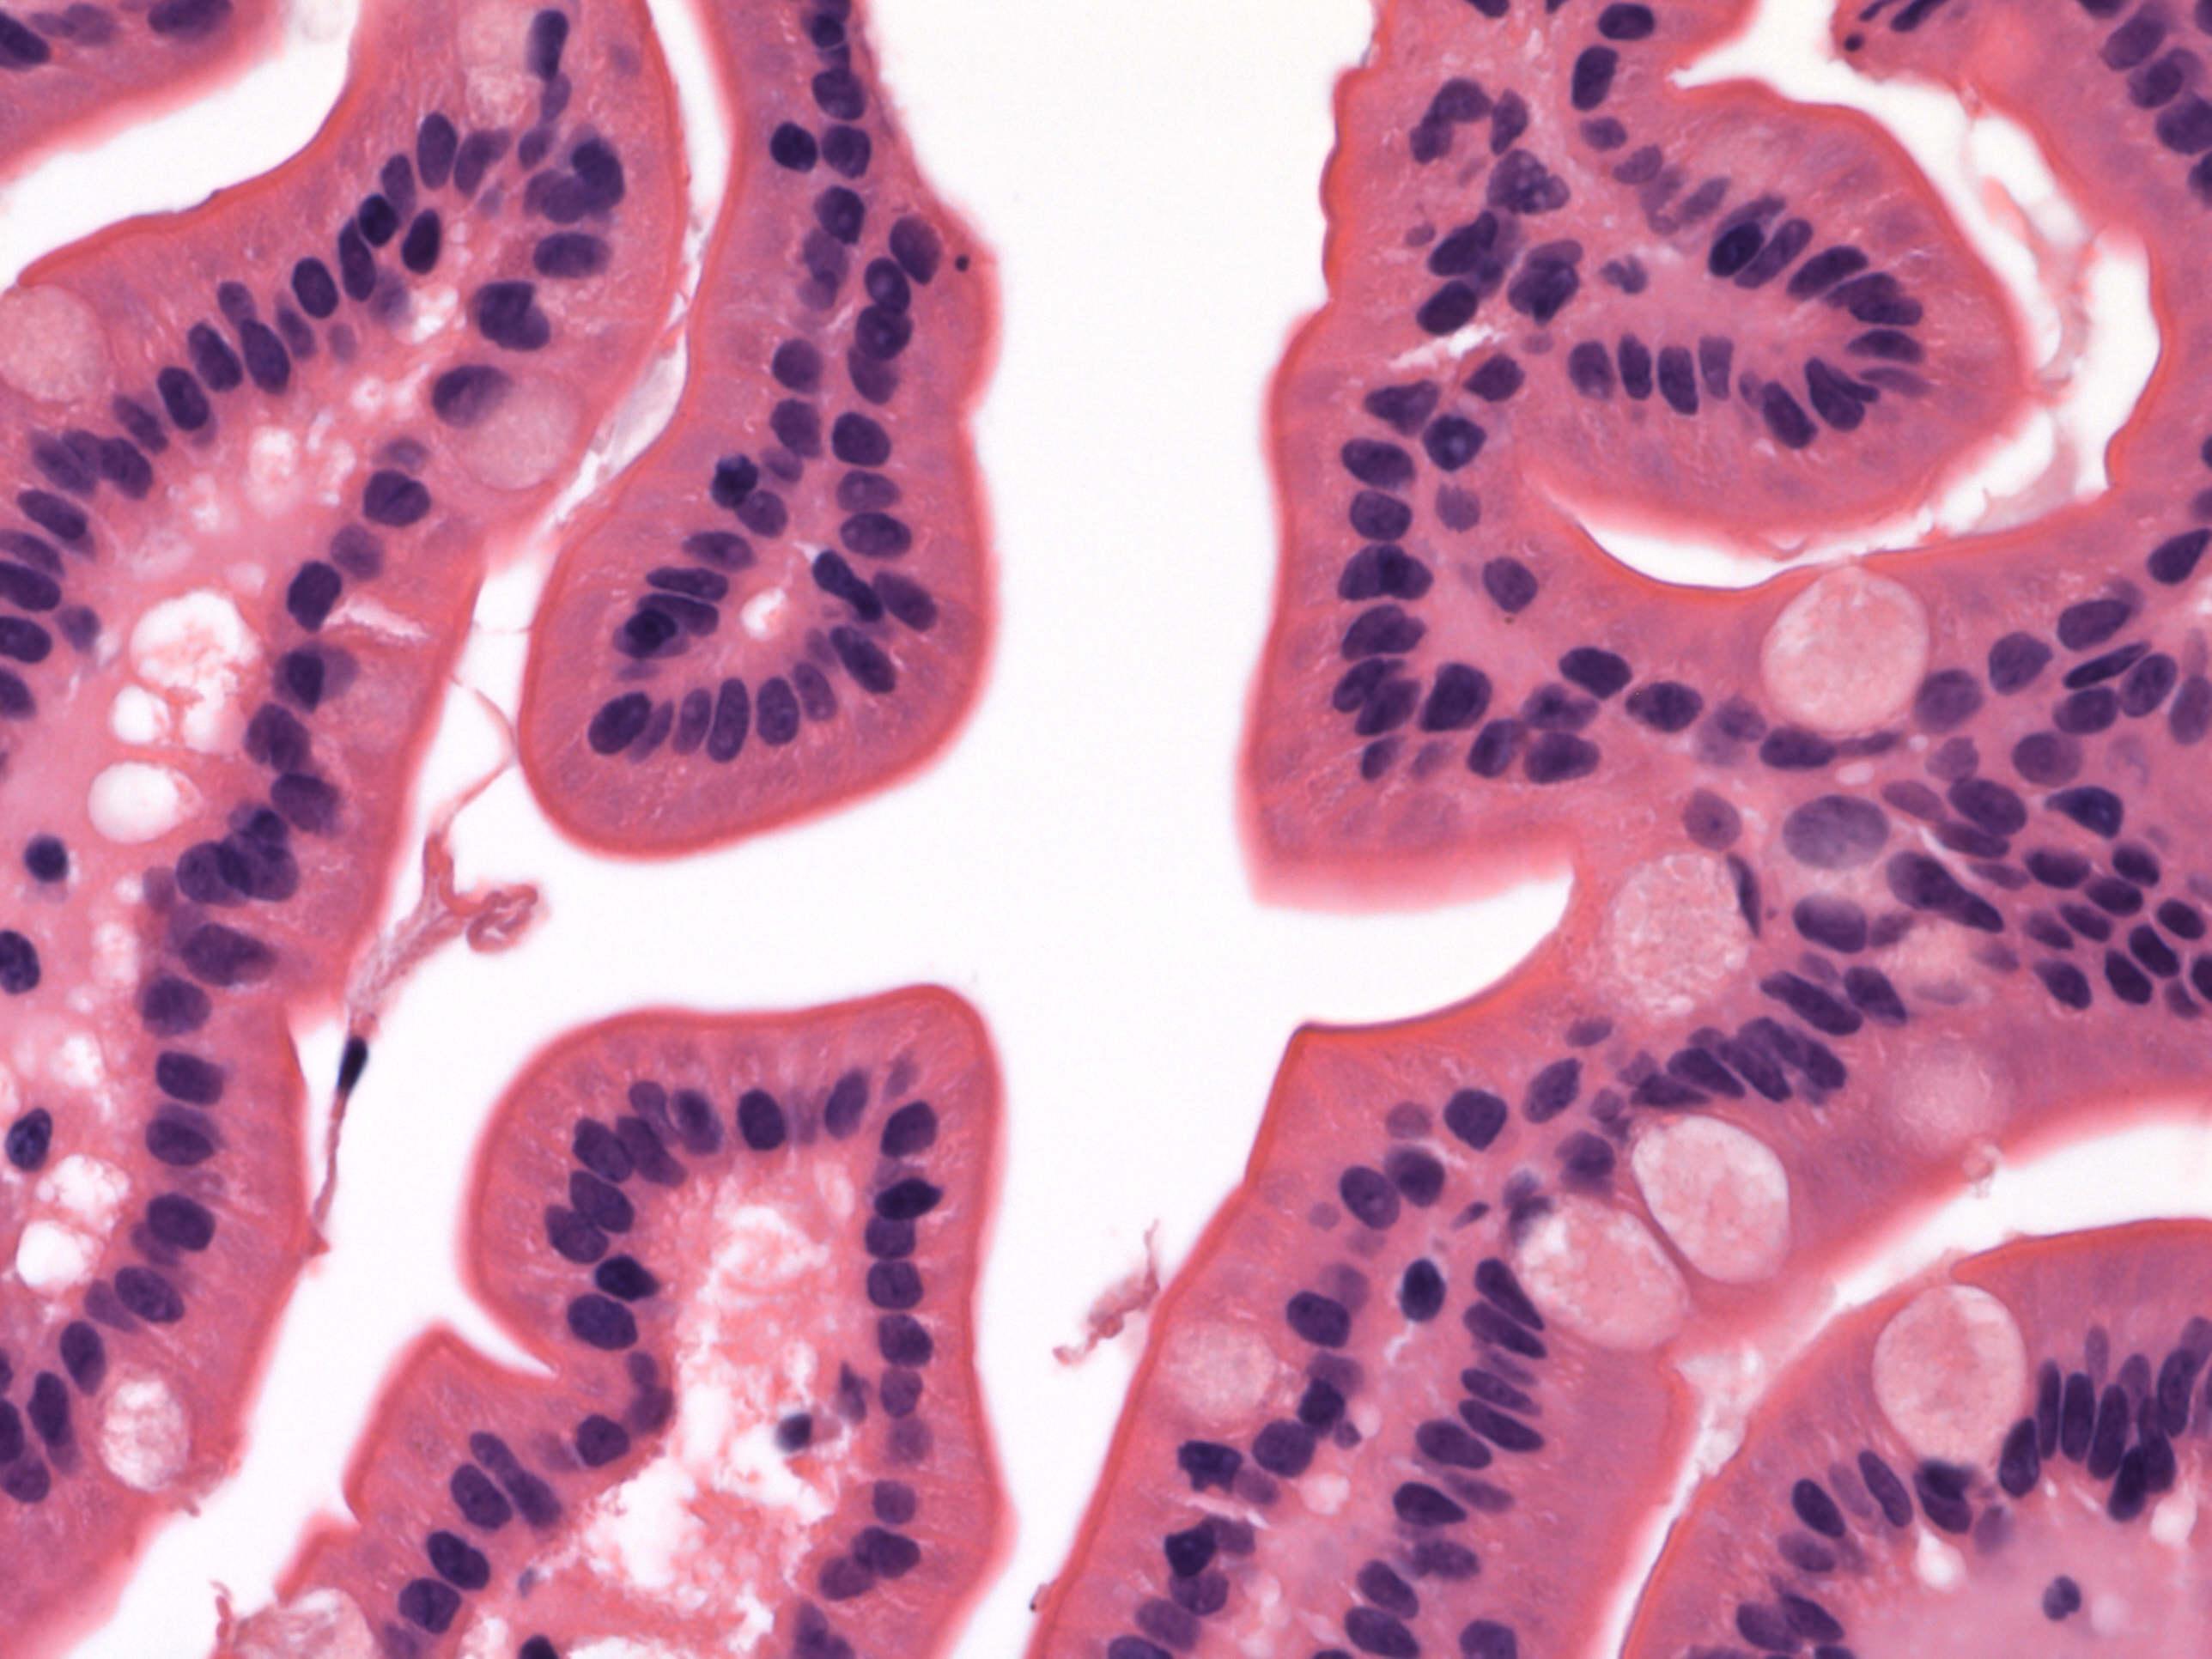 Small intestine-normal (duodenum)